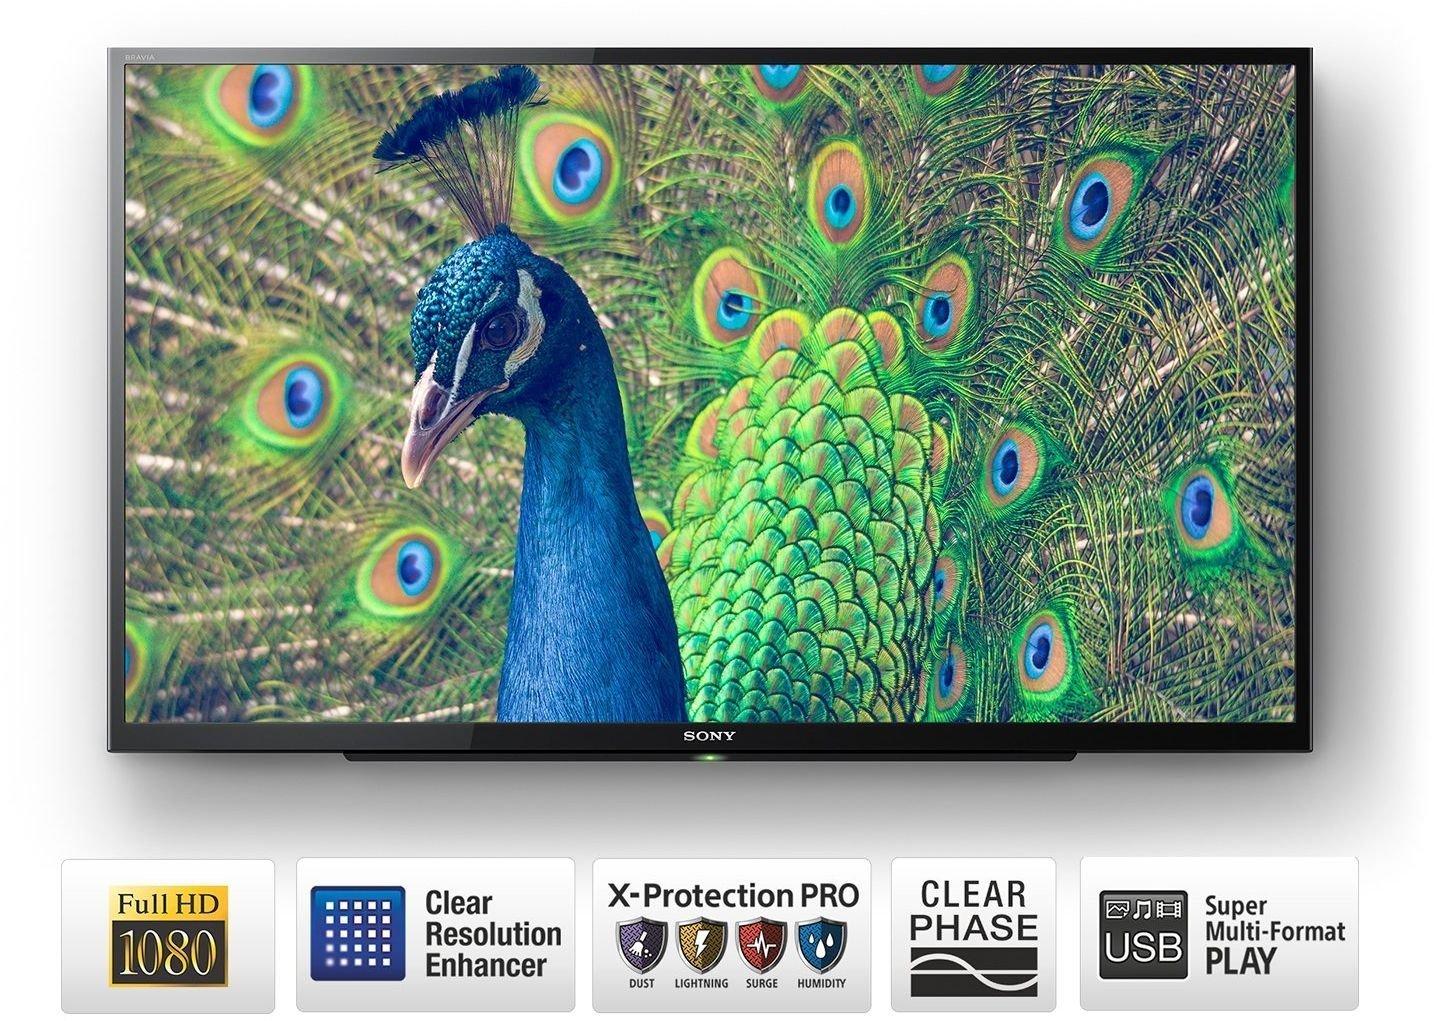 Best 40 inch LED TVs in India under 40,000 - Sony Bravia KLV-40R352E Full HD LED TV